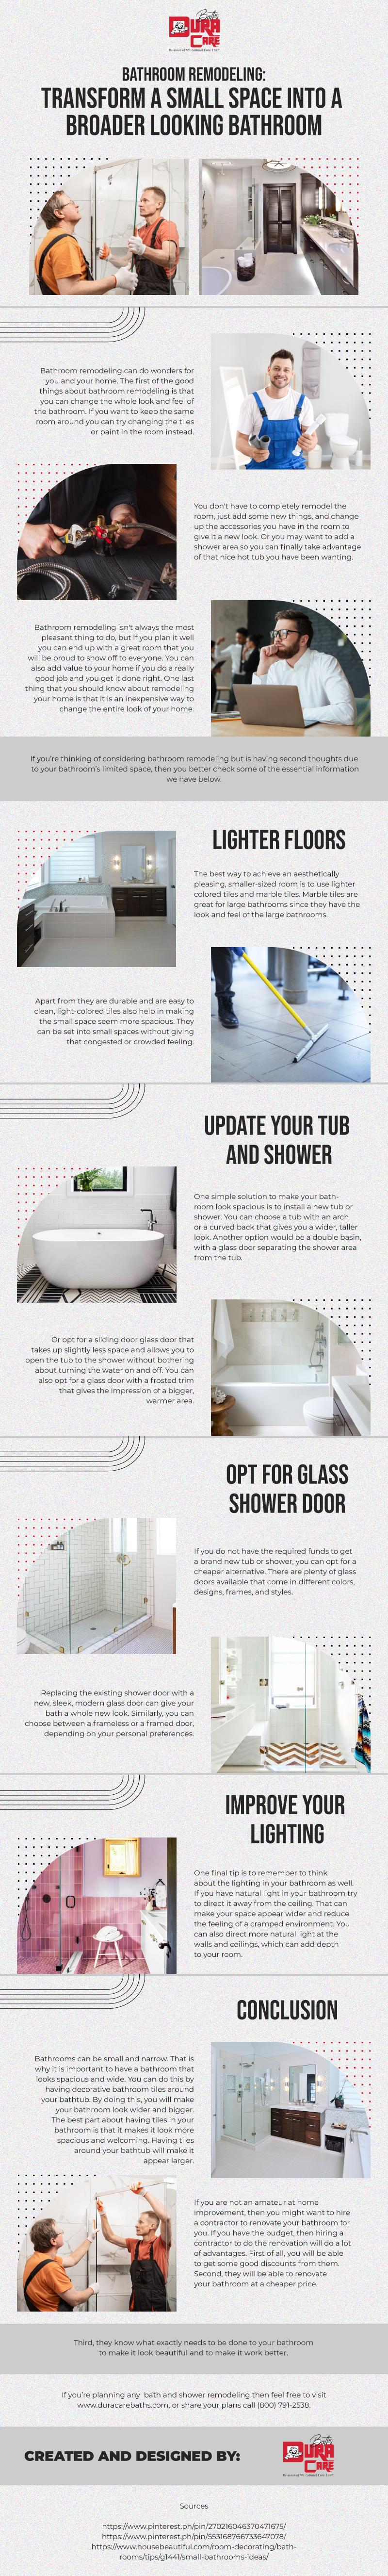 Transform a Small Space into a Broader Looking Bathroom